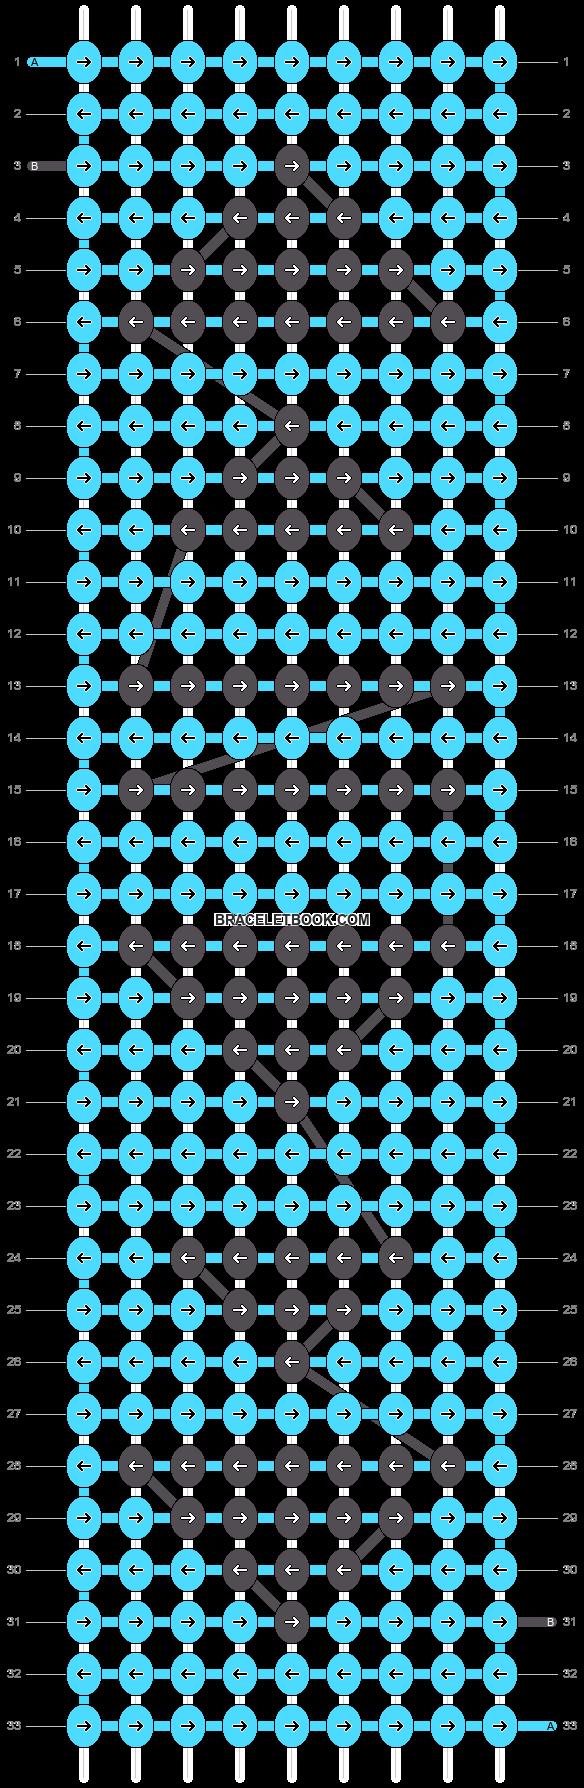 Alpha Pattern #22453 added by JRodriguez